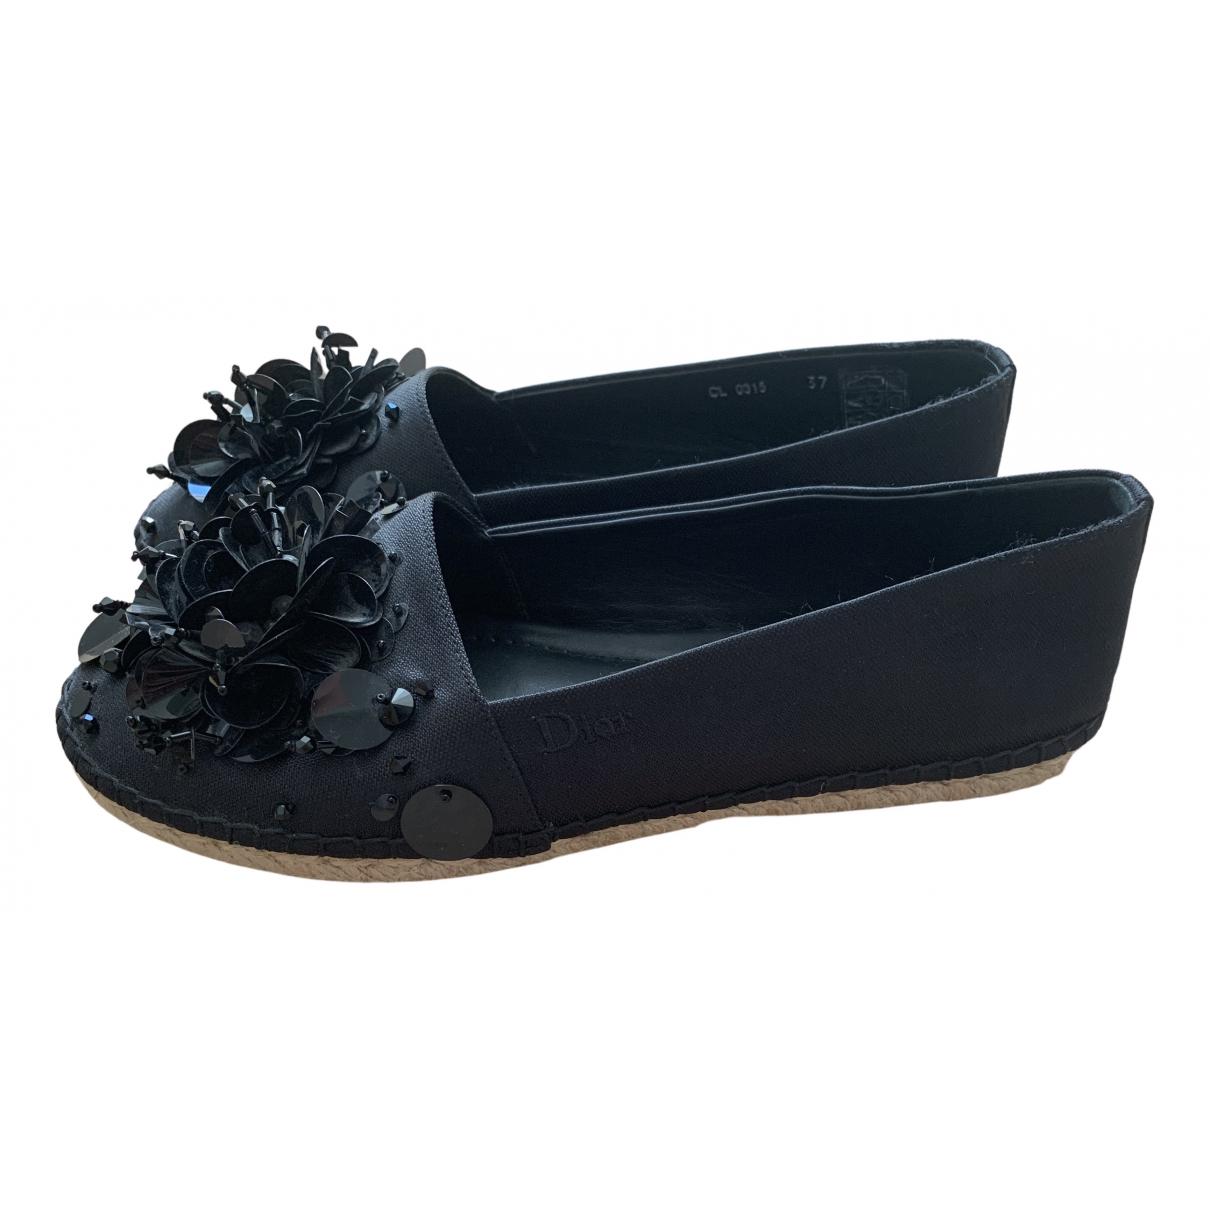 Dior N Black Leather Espadrilles for Women 37 EU